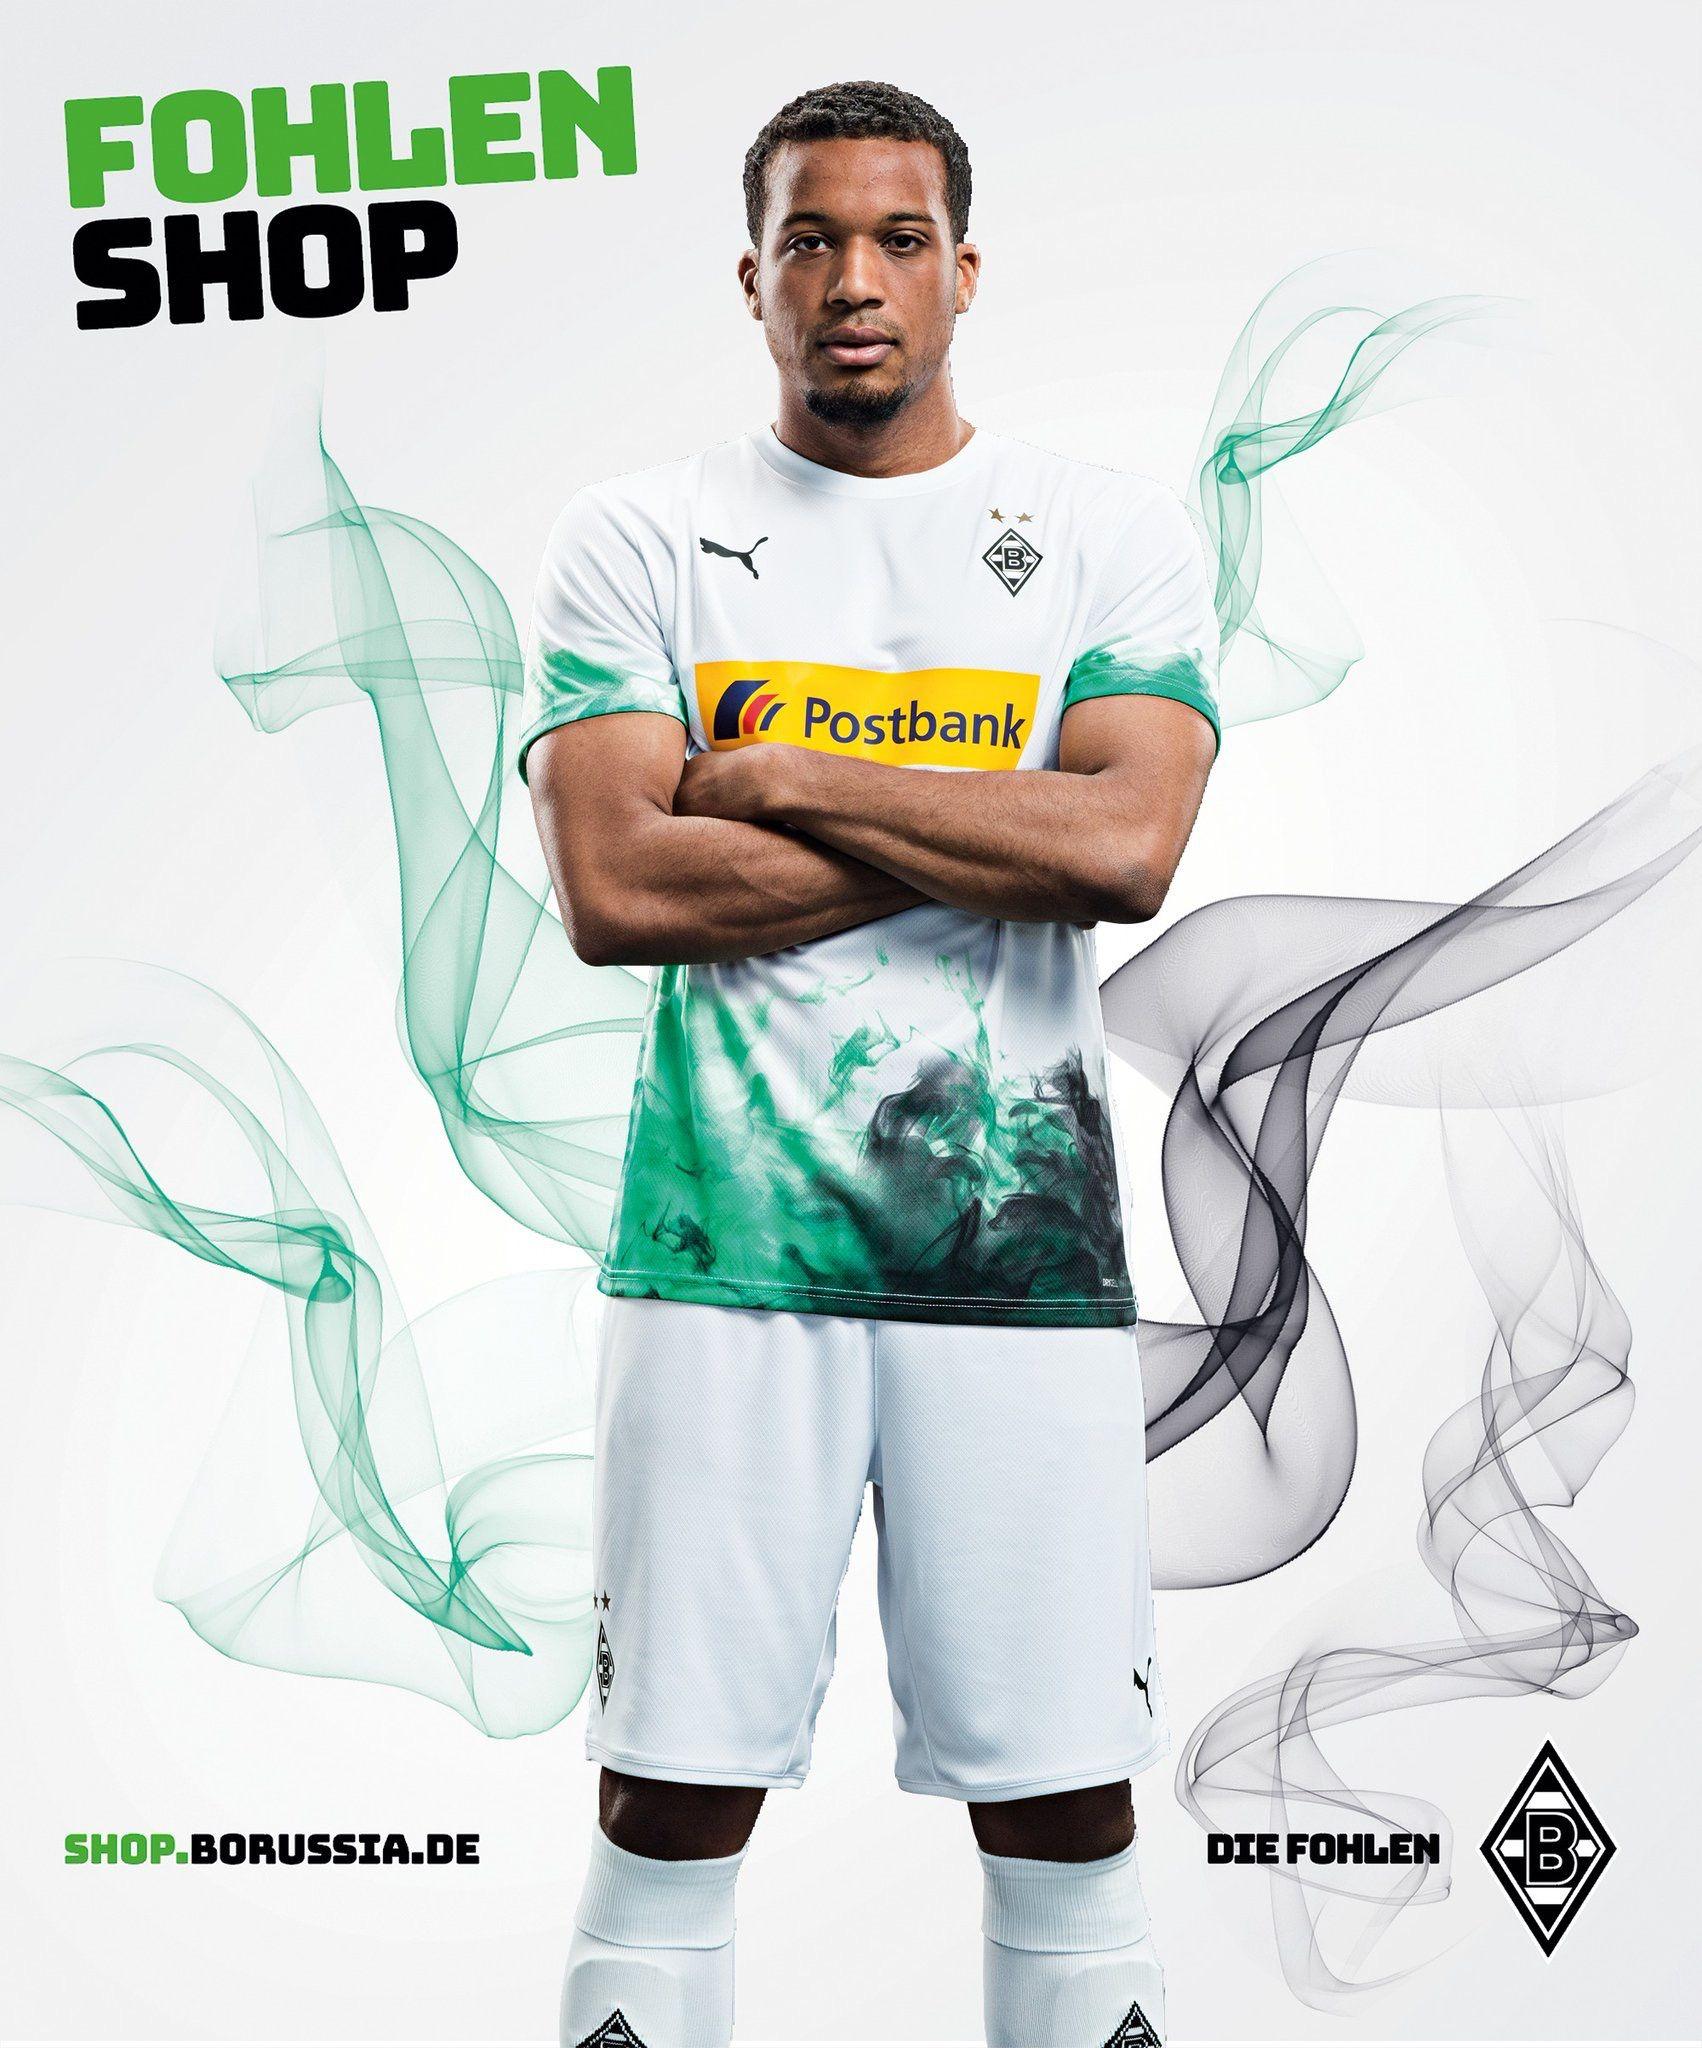 Borussia M Gladbach 2019 2020 Home Kit Football Kits Poster Football